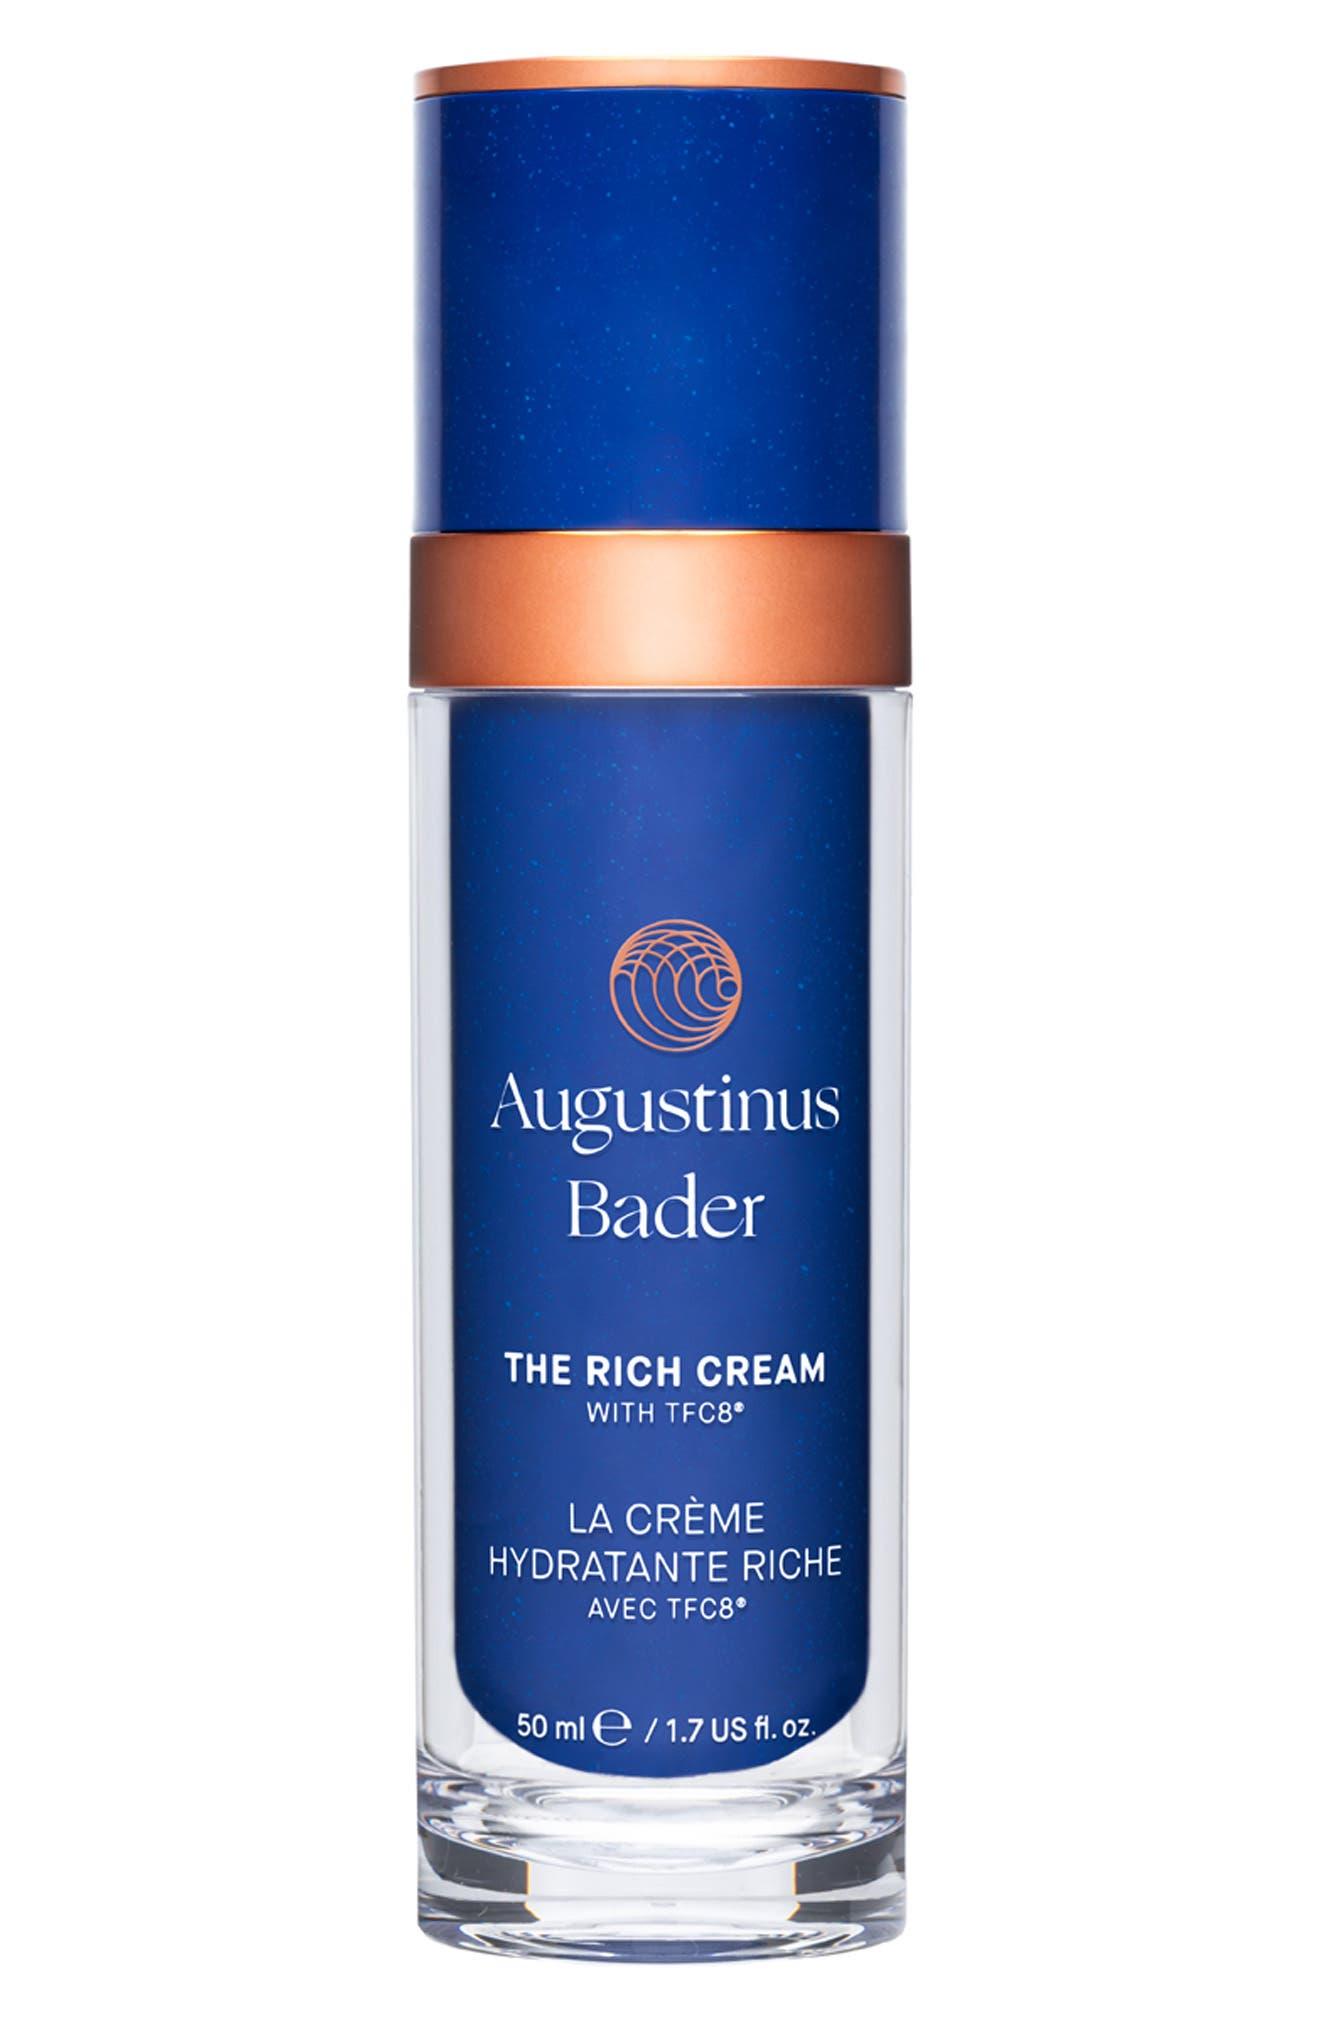 The Rich Cream Face Moisturizer